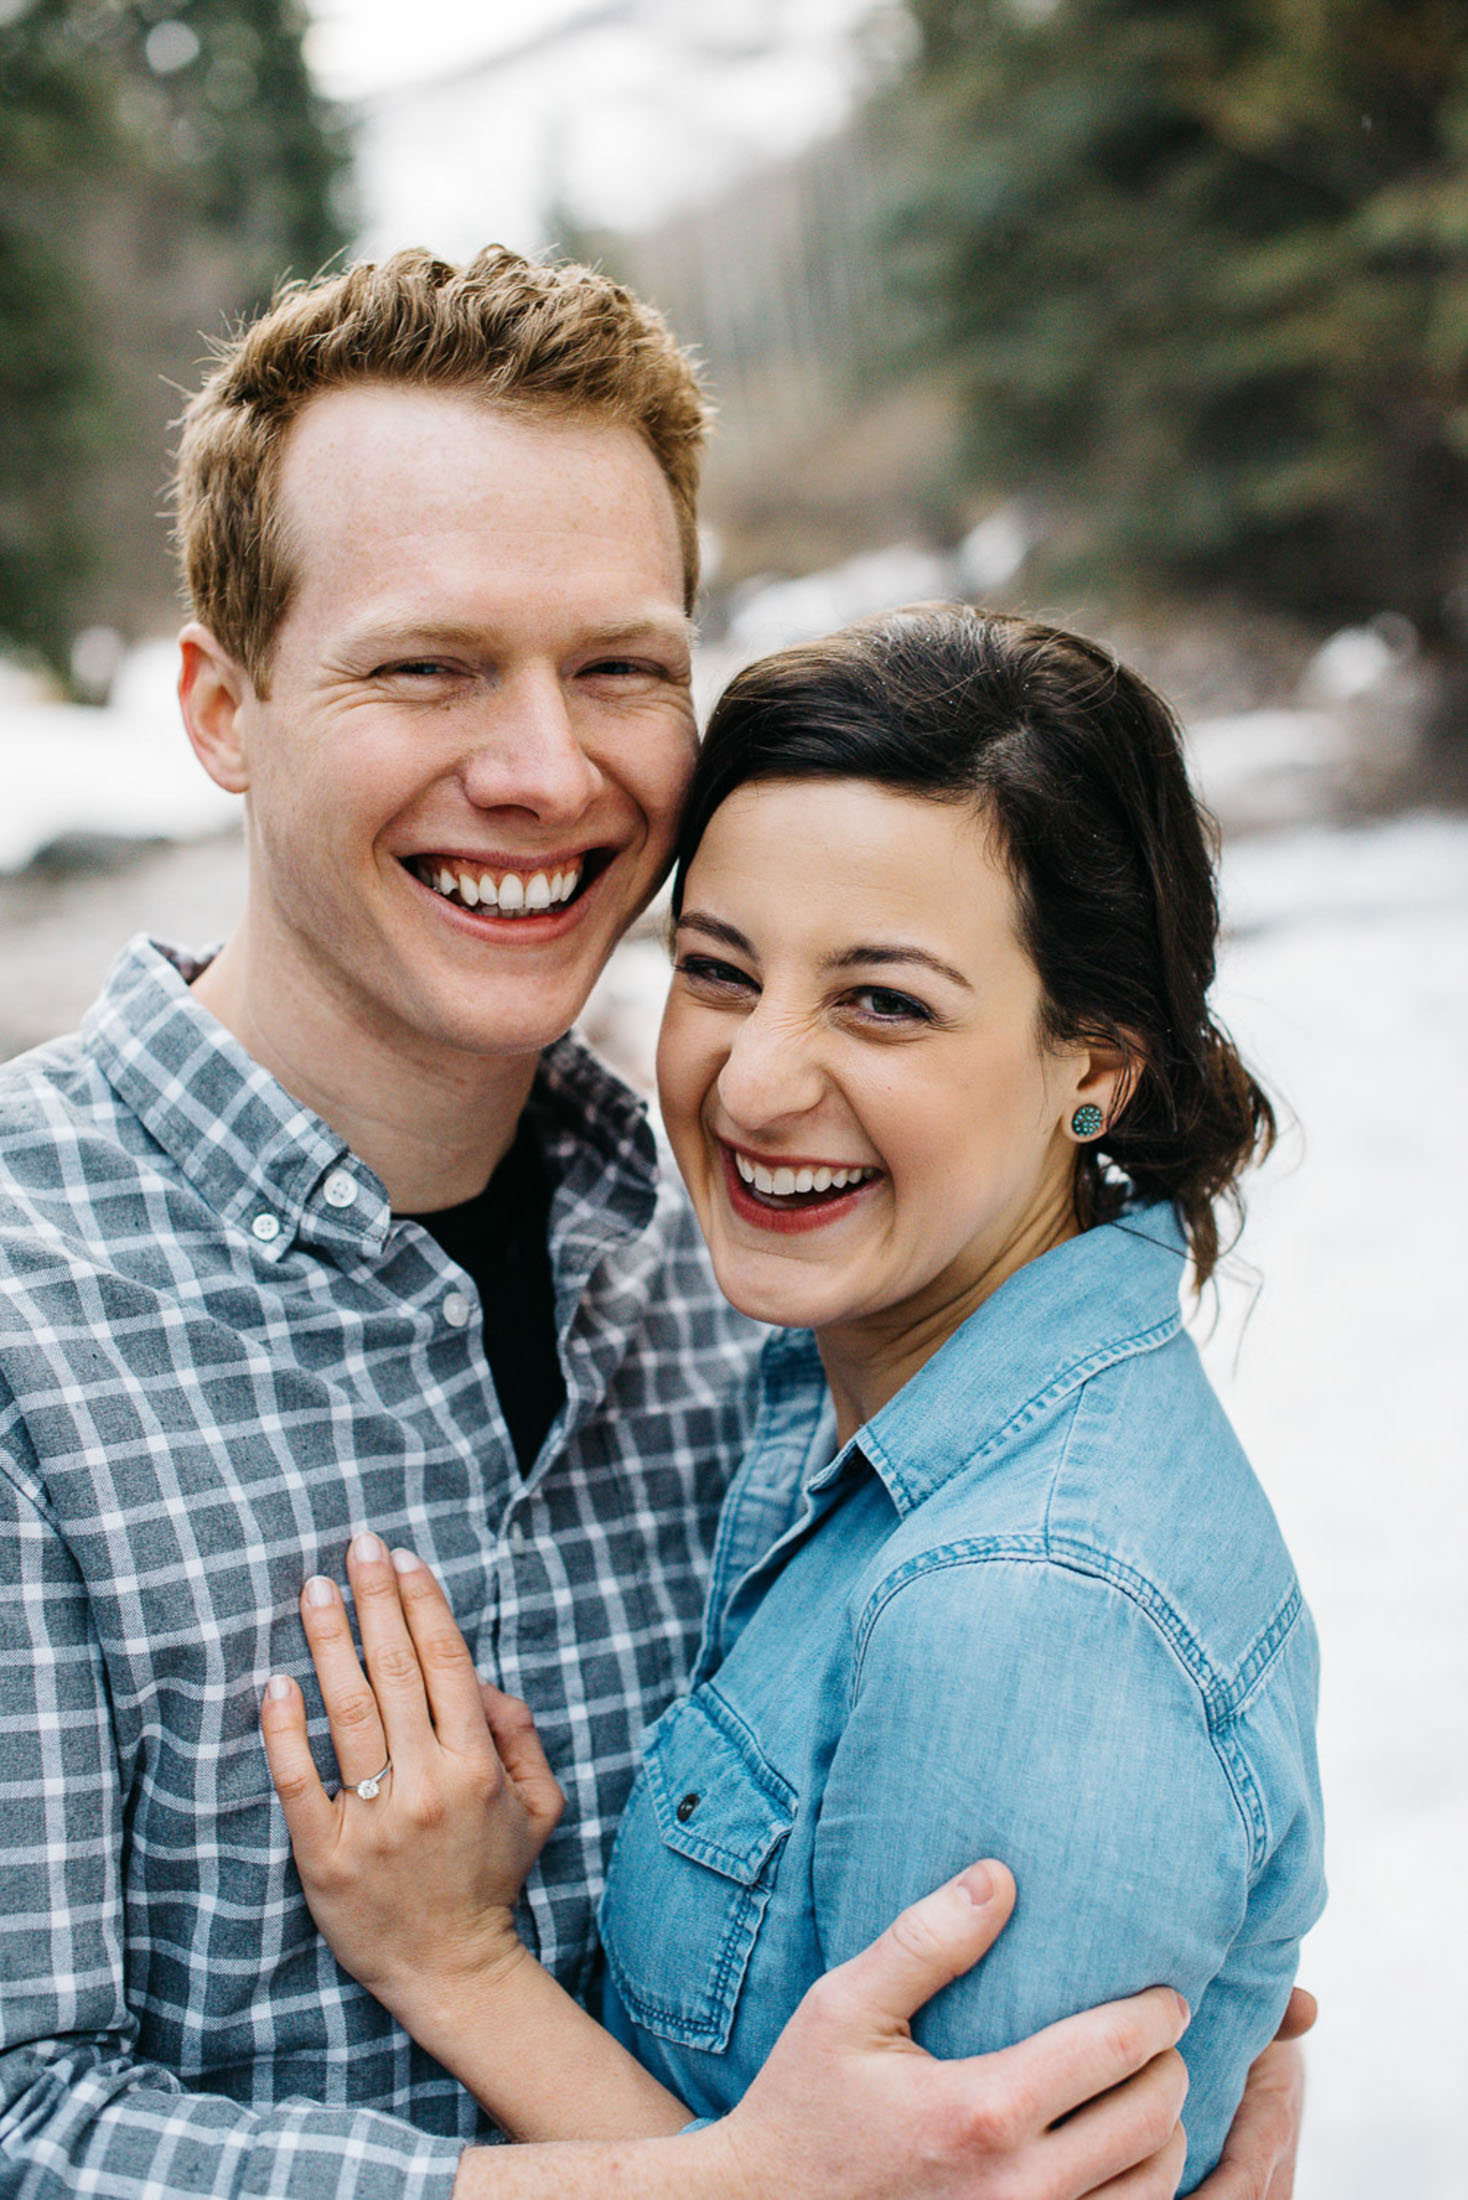 42-37couple-anniversary-engagement-photographer-colorado-mountain-wedding-photographer-vail-engagement-photos-danielle&mark_engagement254.jpg